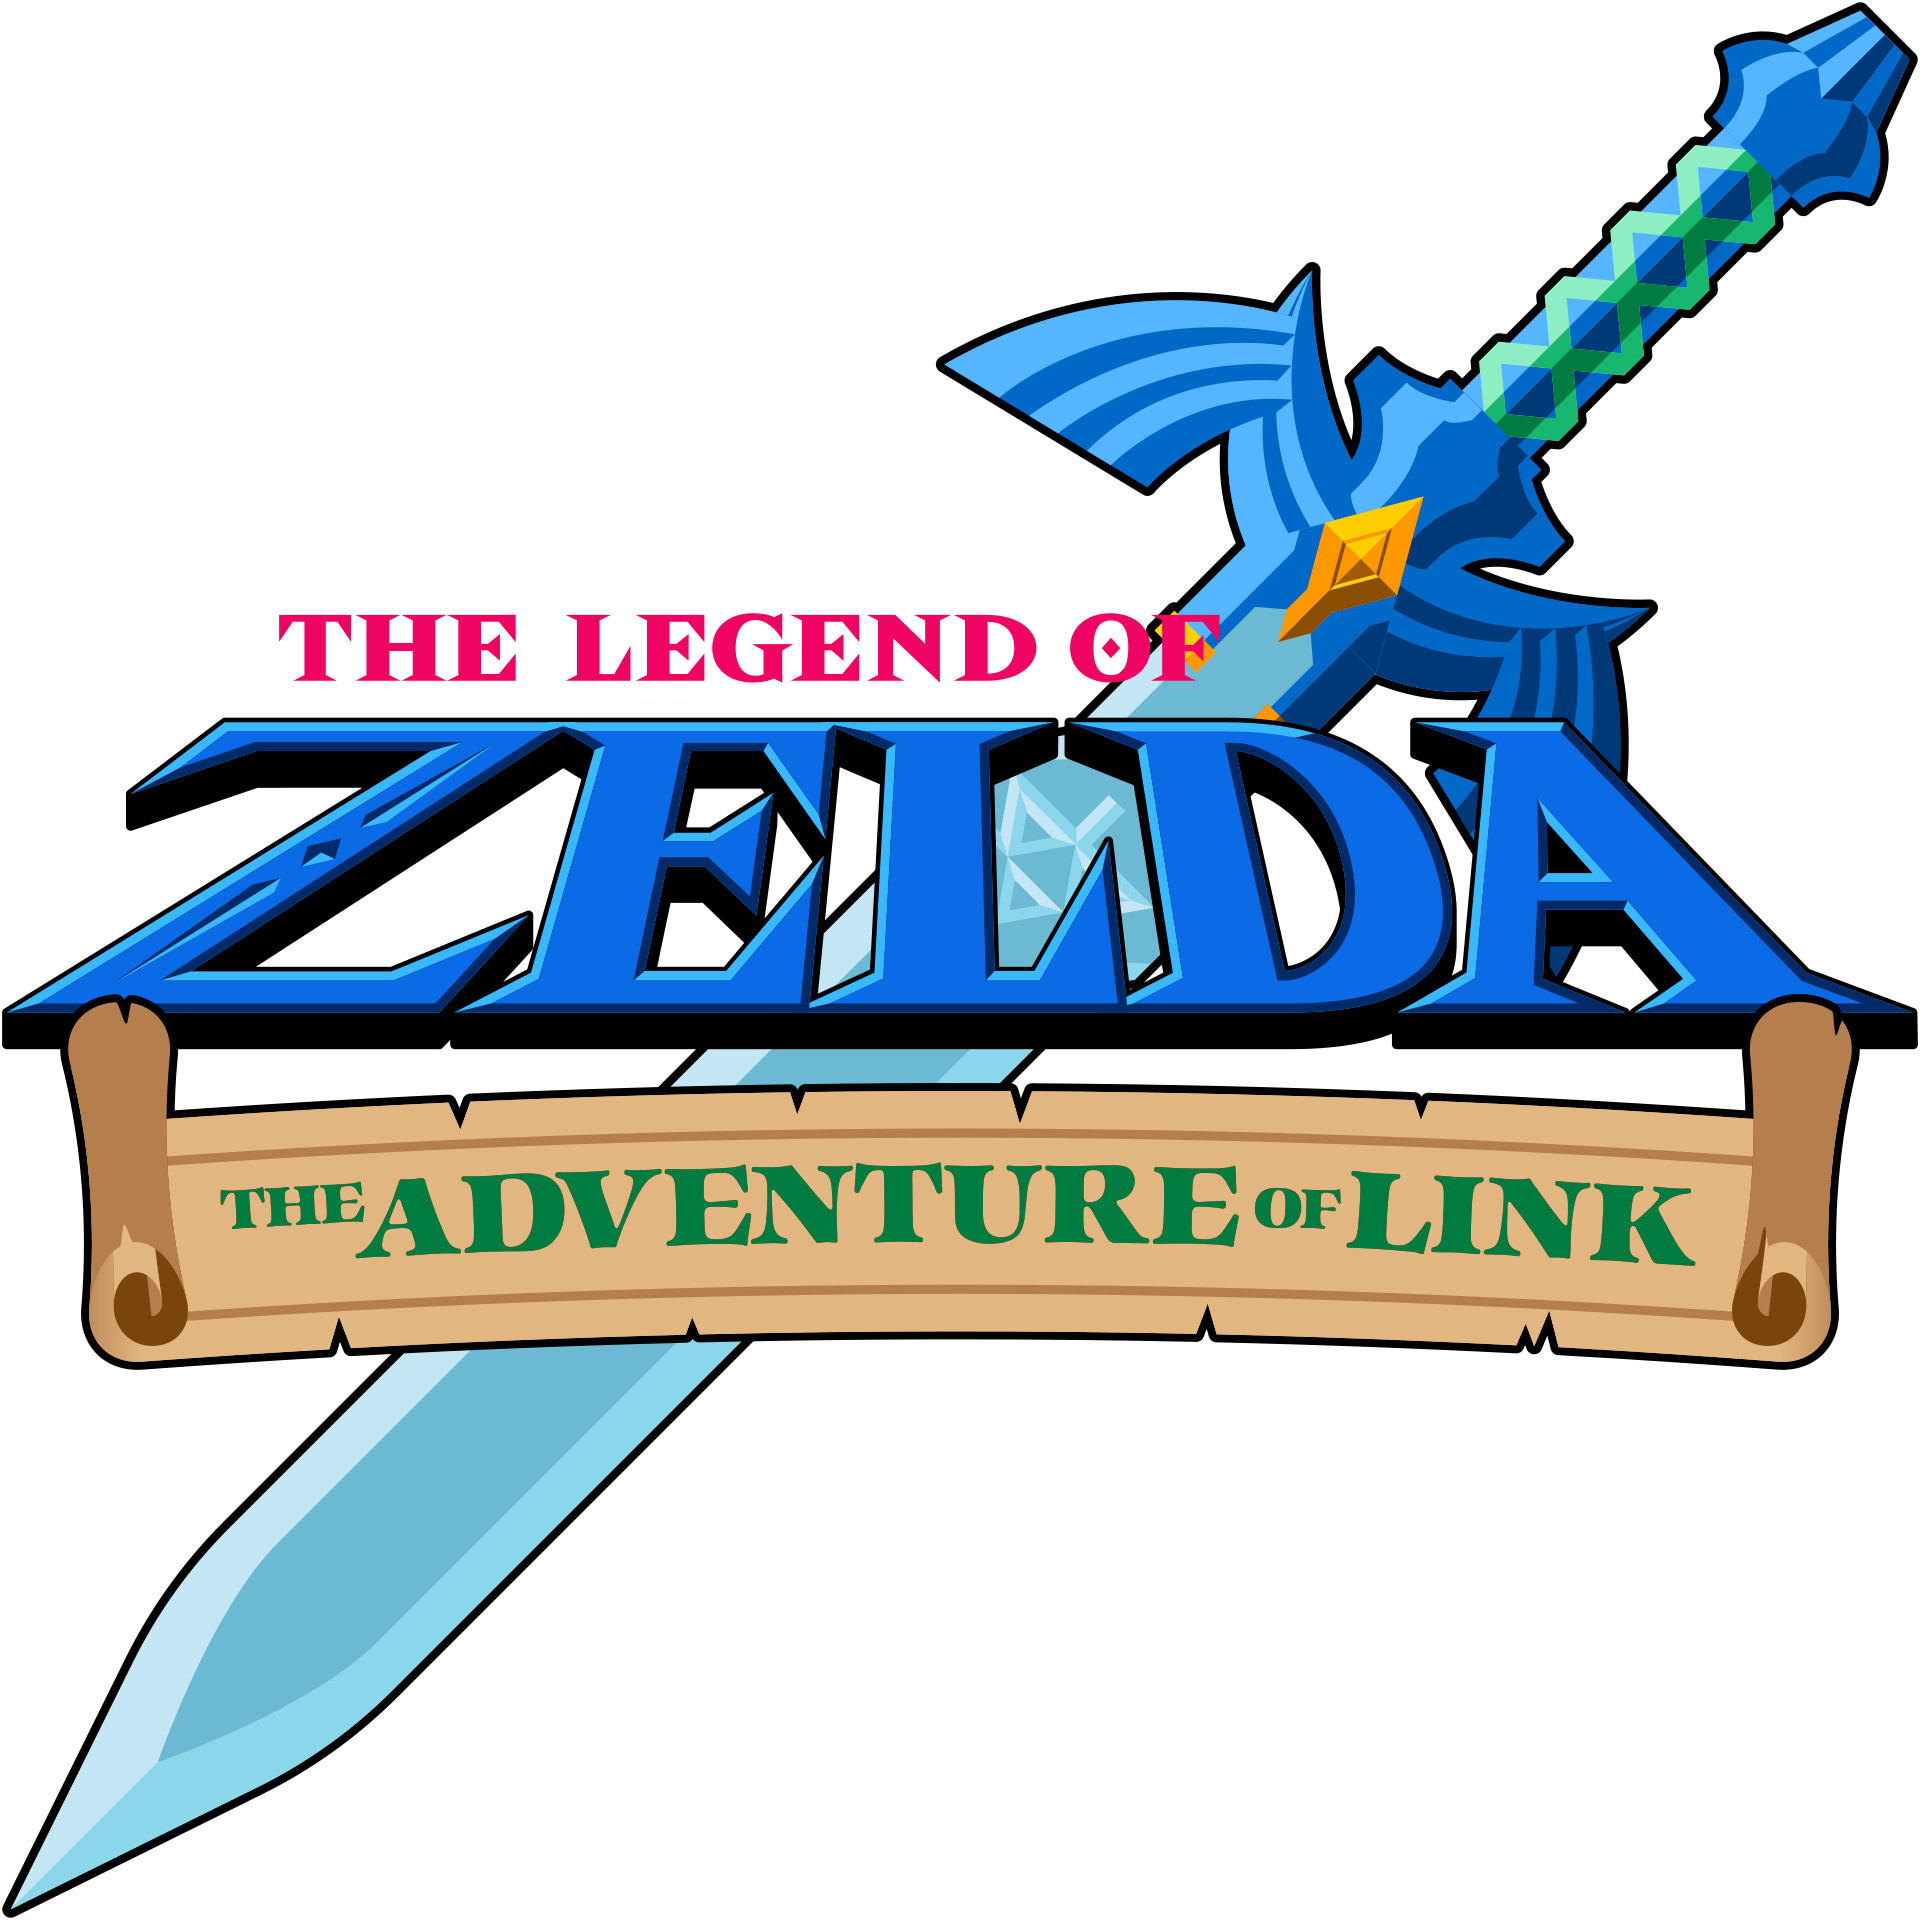 Daniel bernal bernal daniel zelda 2 the adventure of link 2 logo